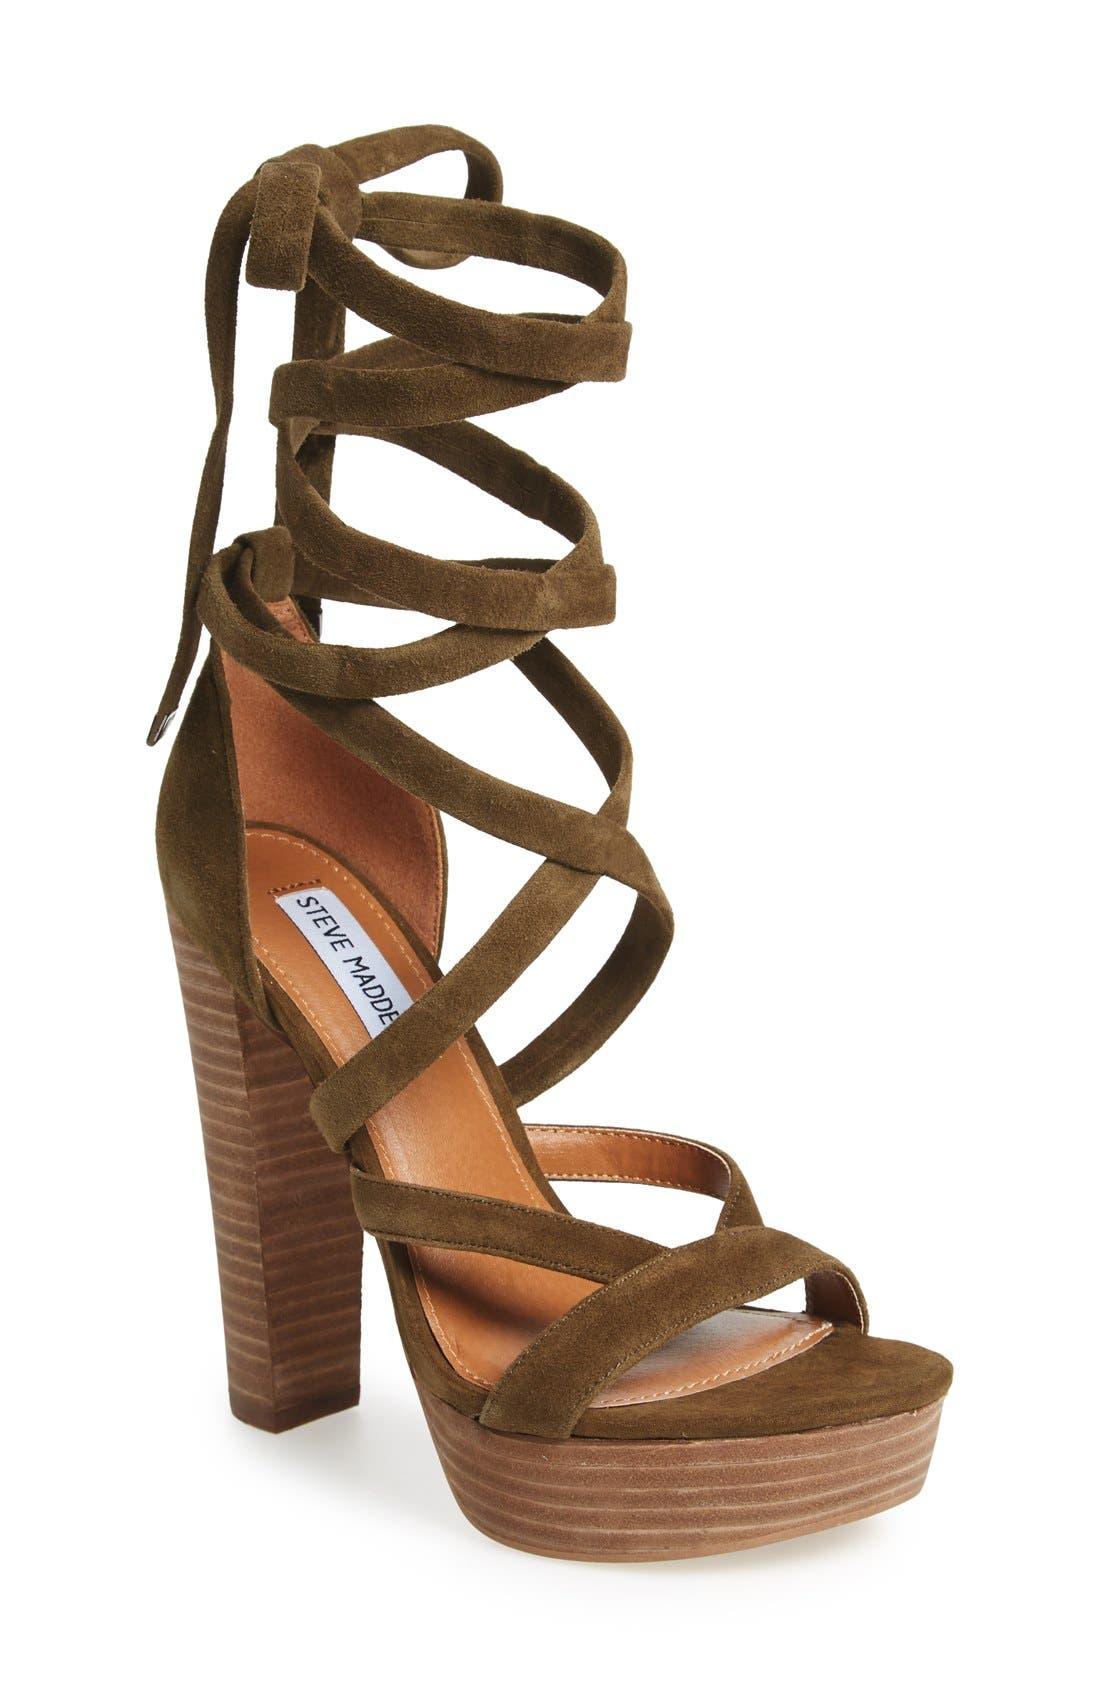 Main Image - Steve Madden 'Laceit' Platform Sandal (Women)